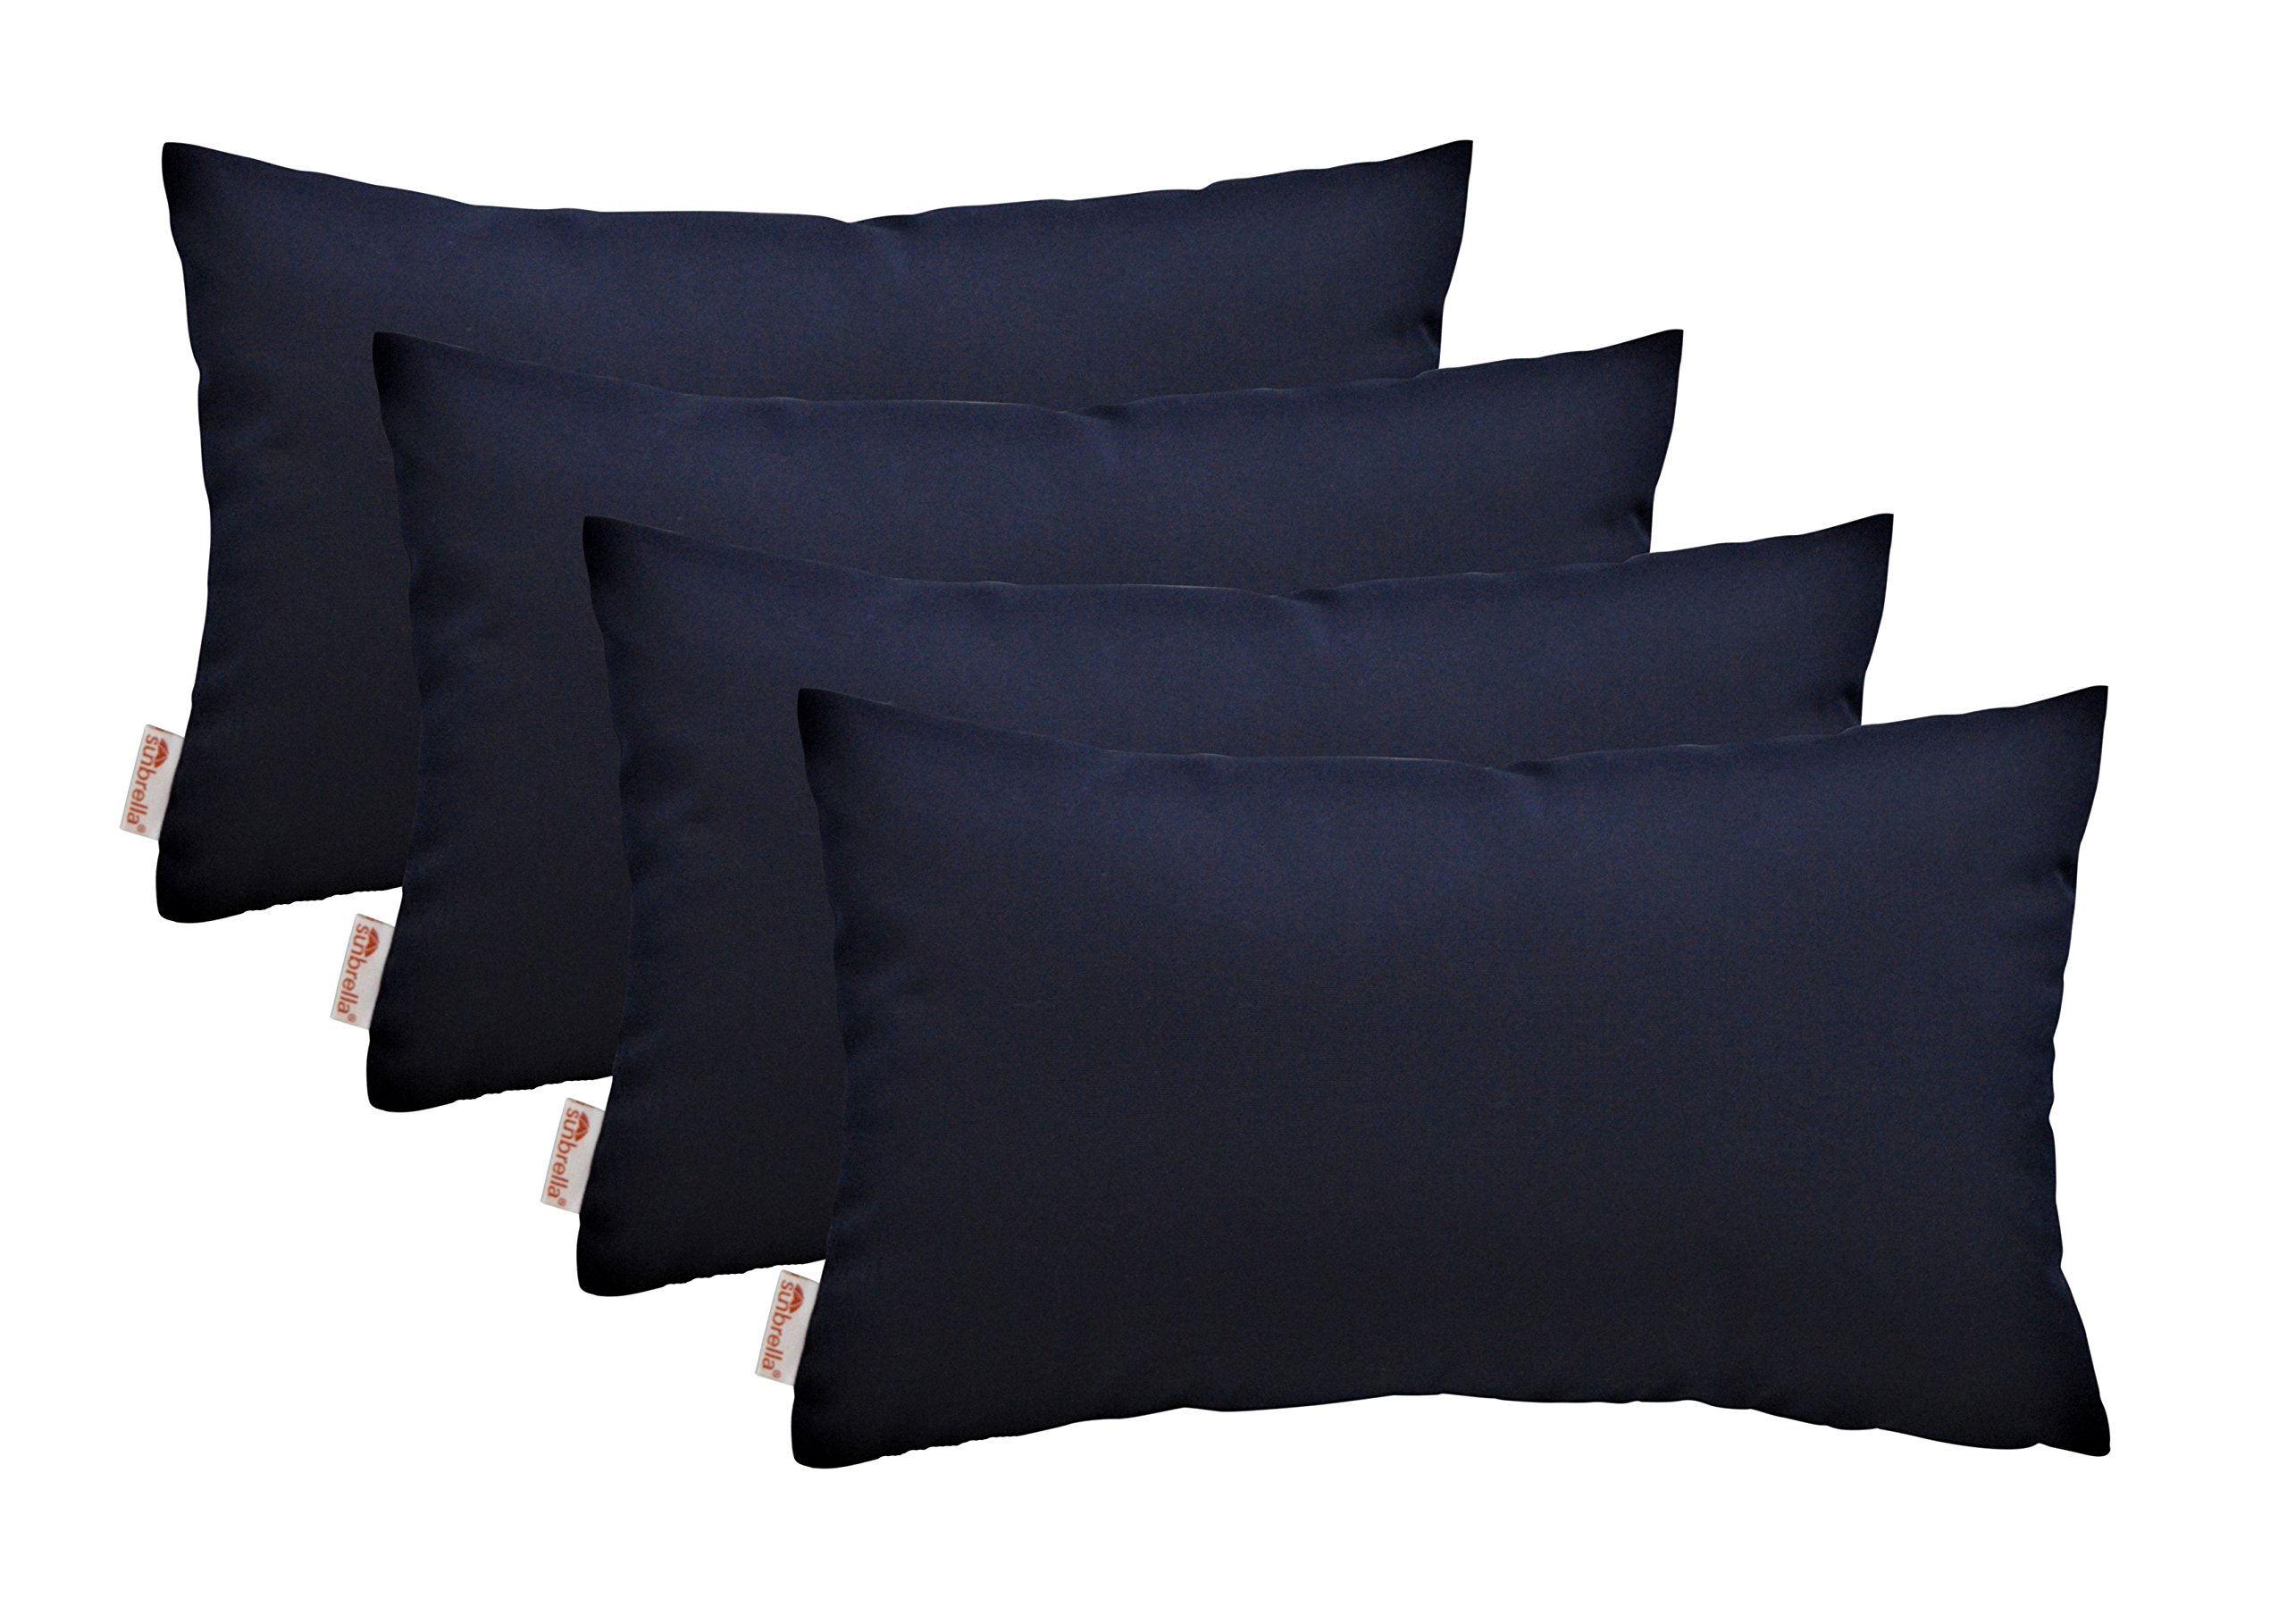 RSH Décor Set of 4 Indoor/Outdoor Decorative Throw Pillows Sunbrella Navy Blue - 12'' x 20''